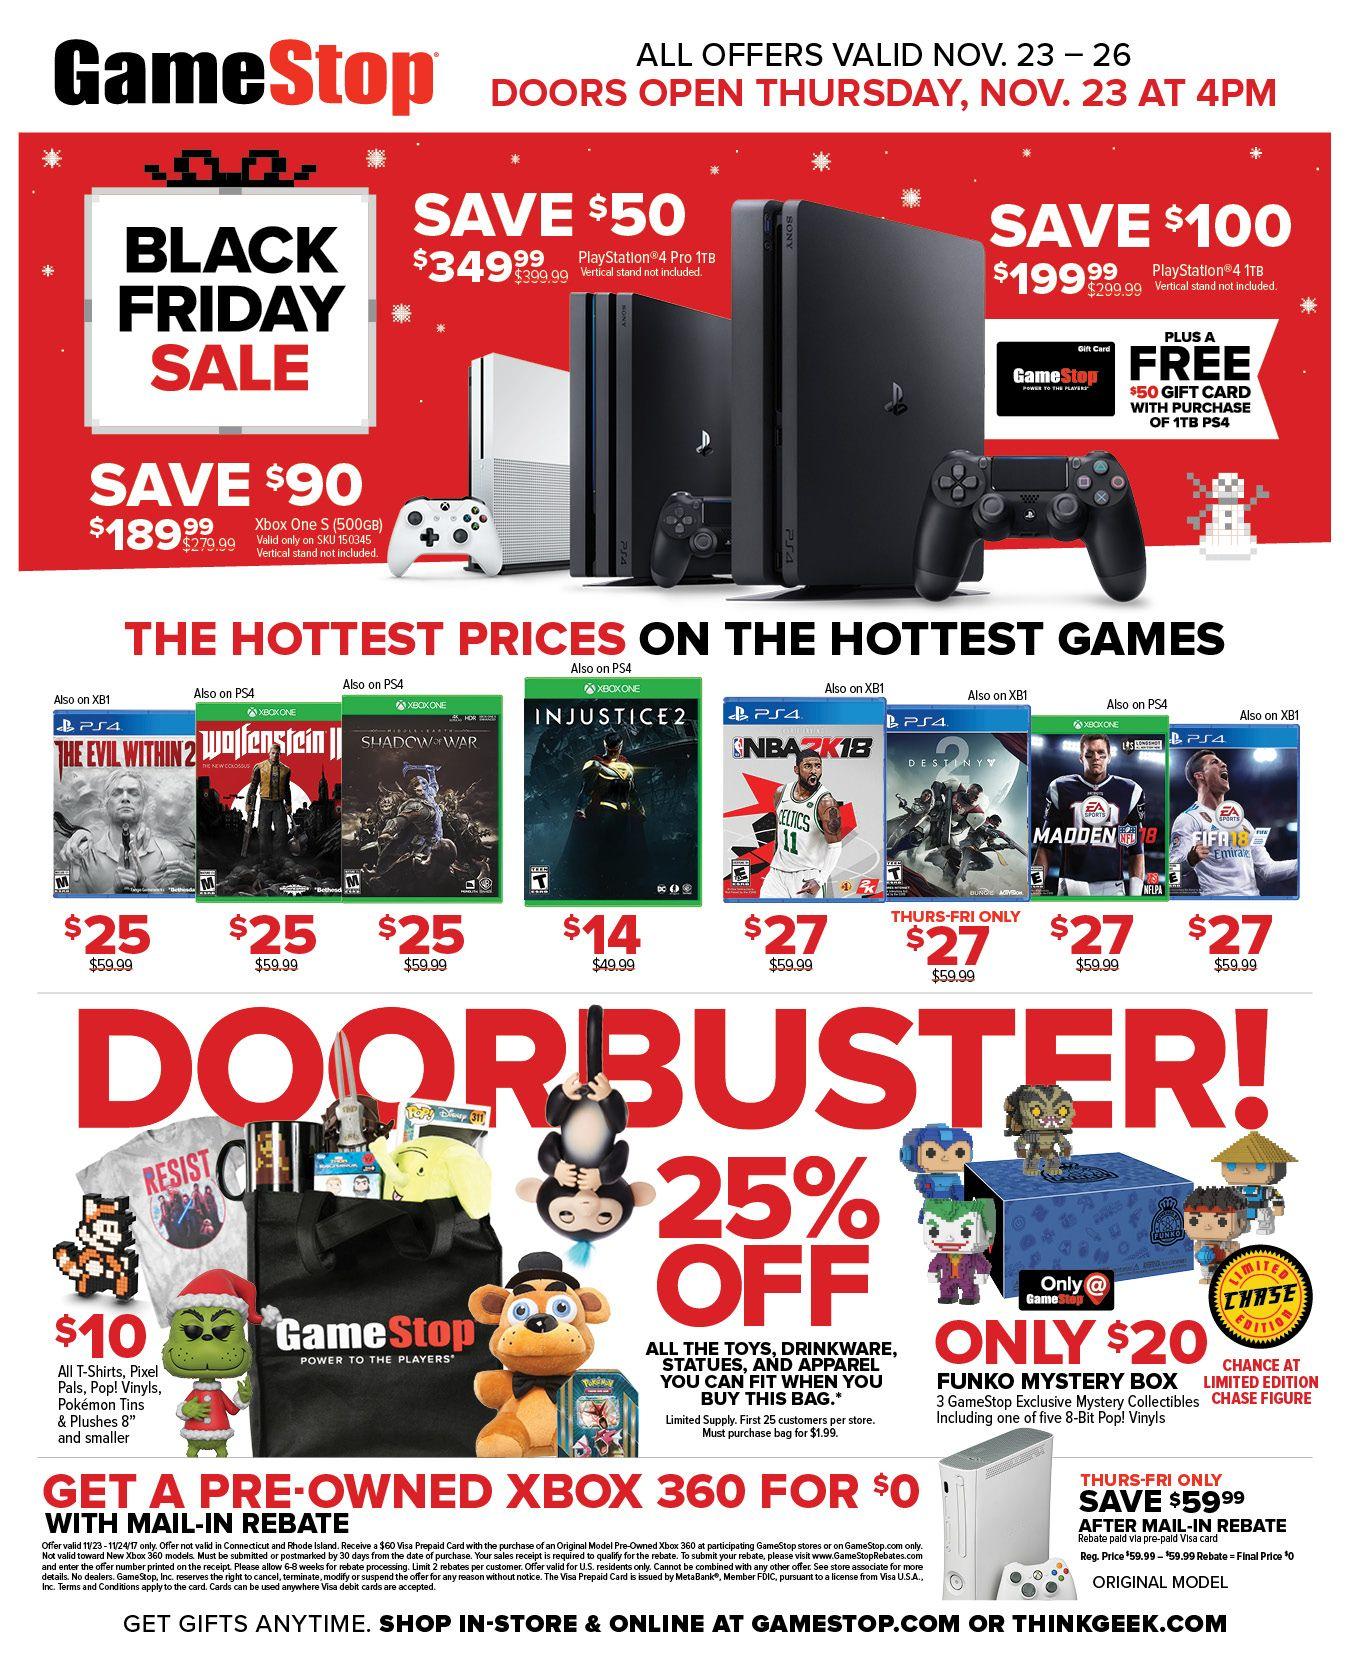 2017 Black Friday Deals Sales On Video Games Consoles More Gamestop Black Friday Ads Black Friday Black Friday Deals